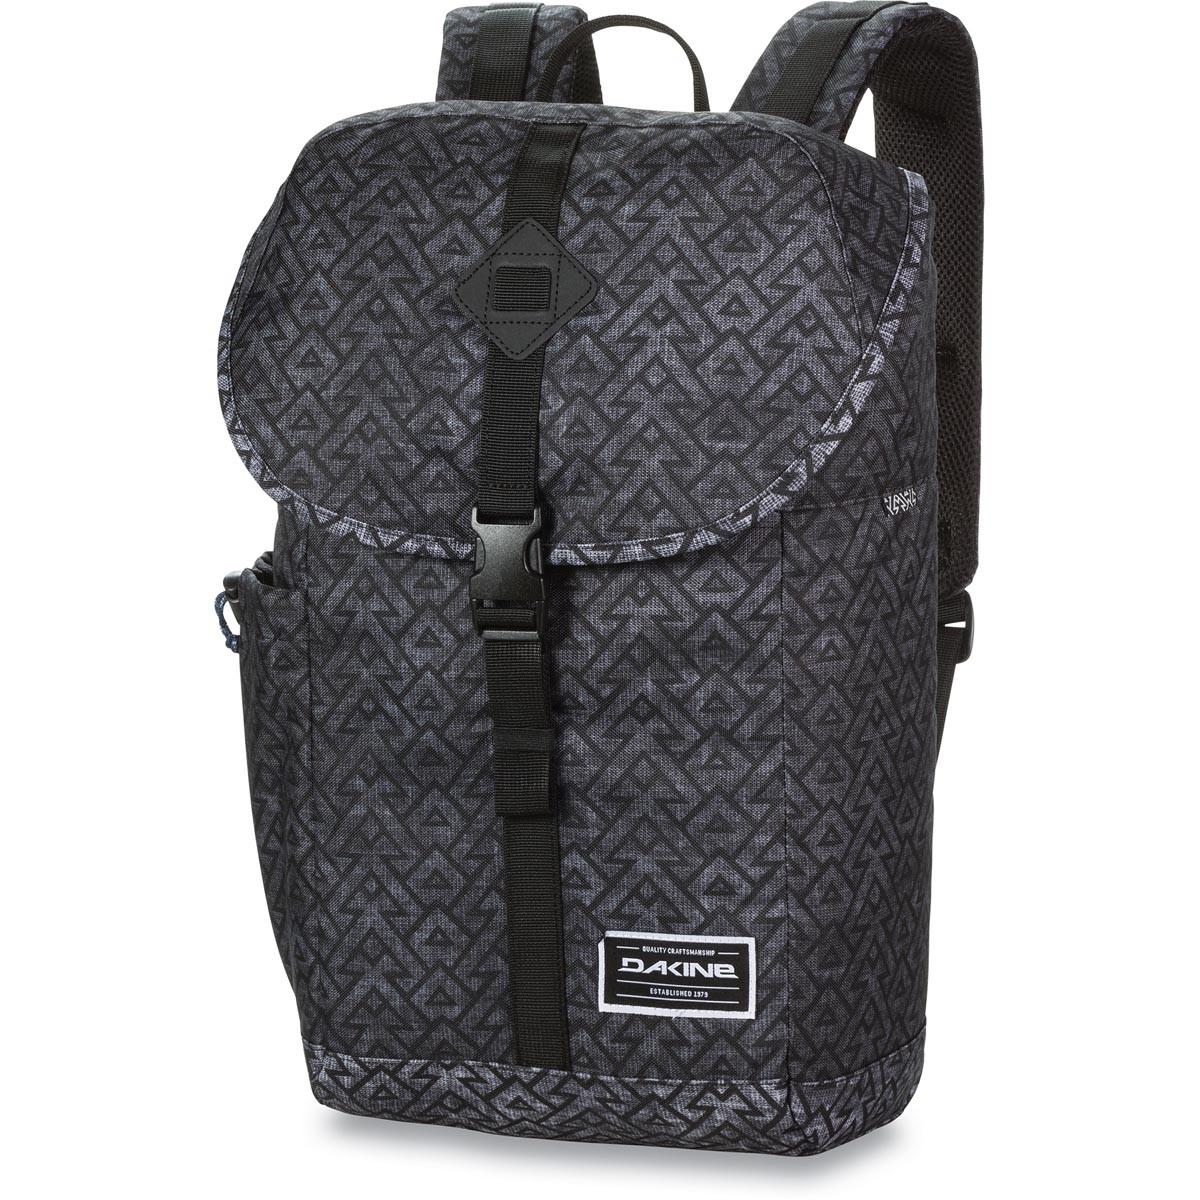 795dc4bb19054 Dakine Range 24L Backpack Stacked